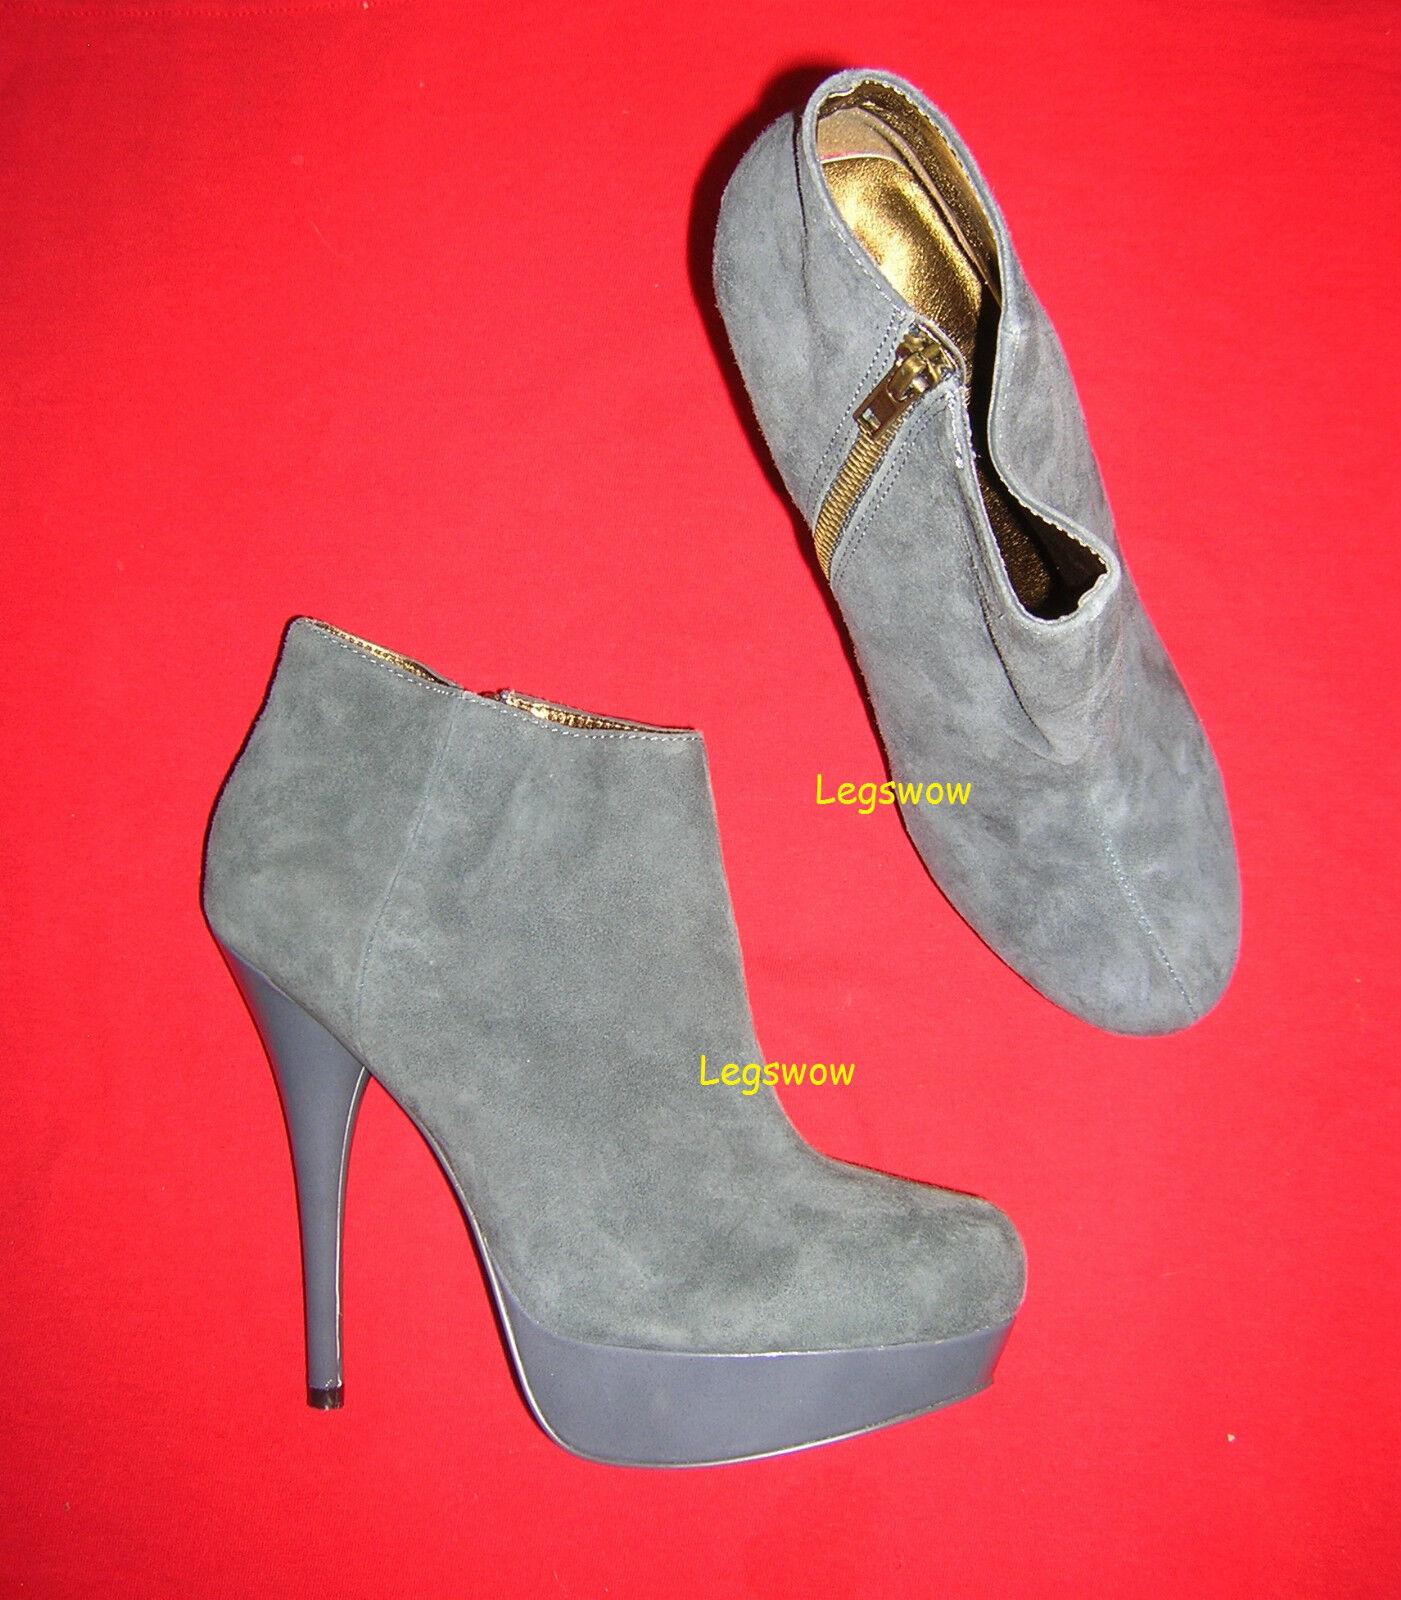 Steve Madden Gray Stivali Suede Platforms Booties Stivali Gray 5.5 Heels Shoes 10 Platform New ccdd28